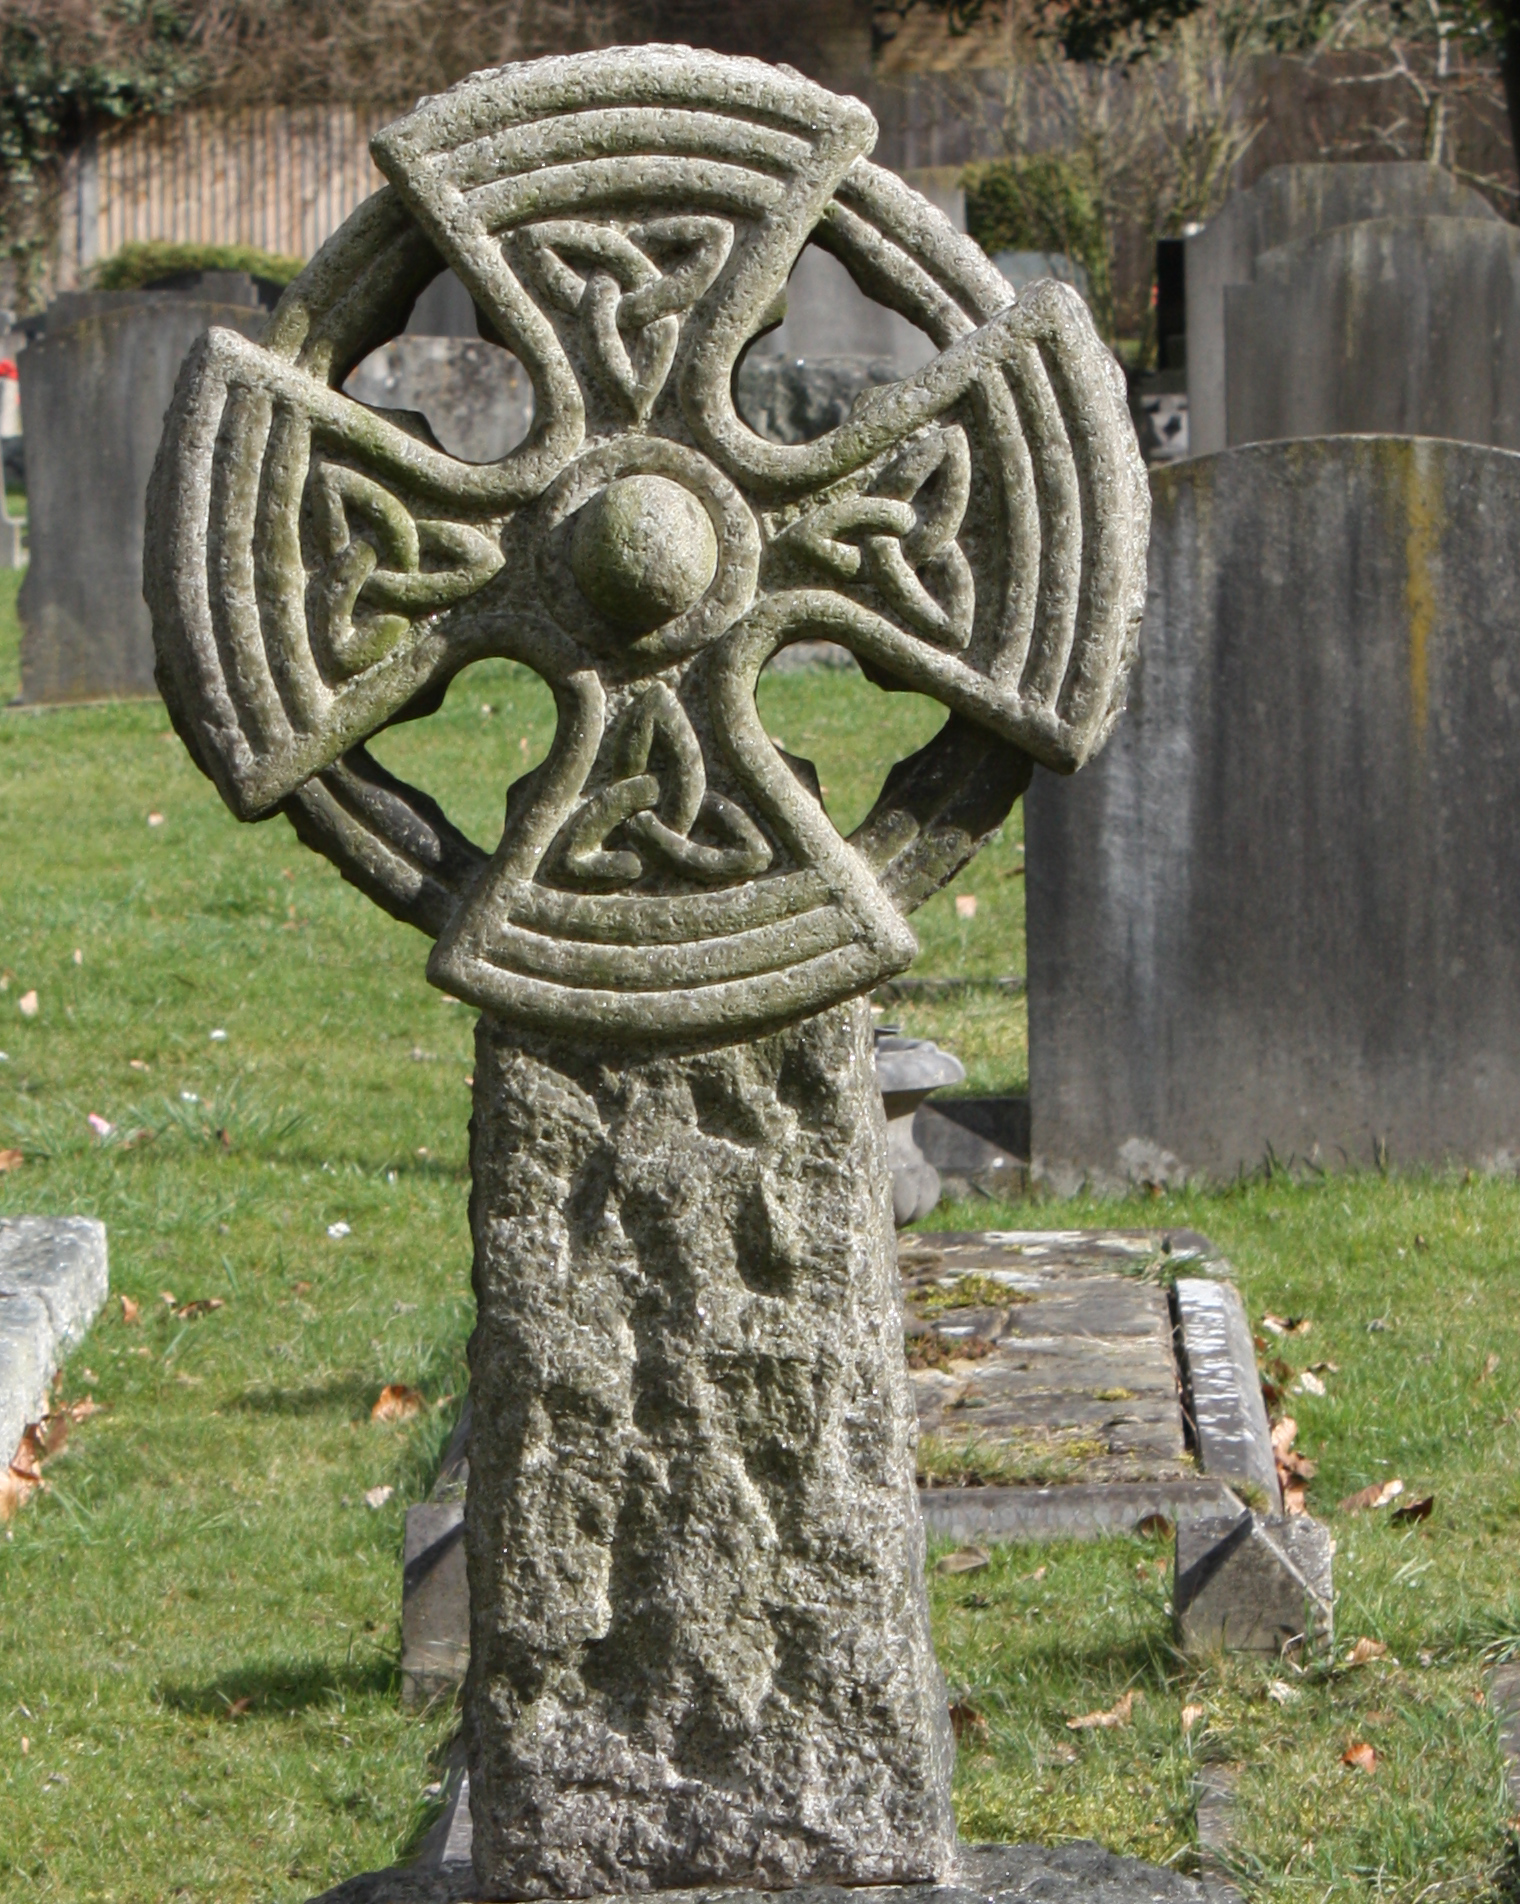 Gravestone, Carved, Celtic, Cemetery, Church, HQ Photo